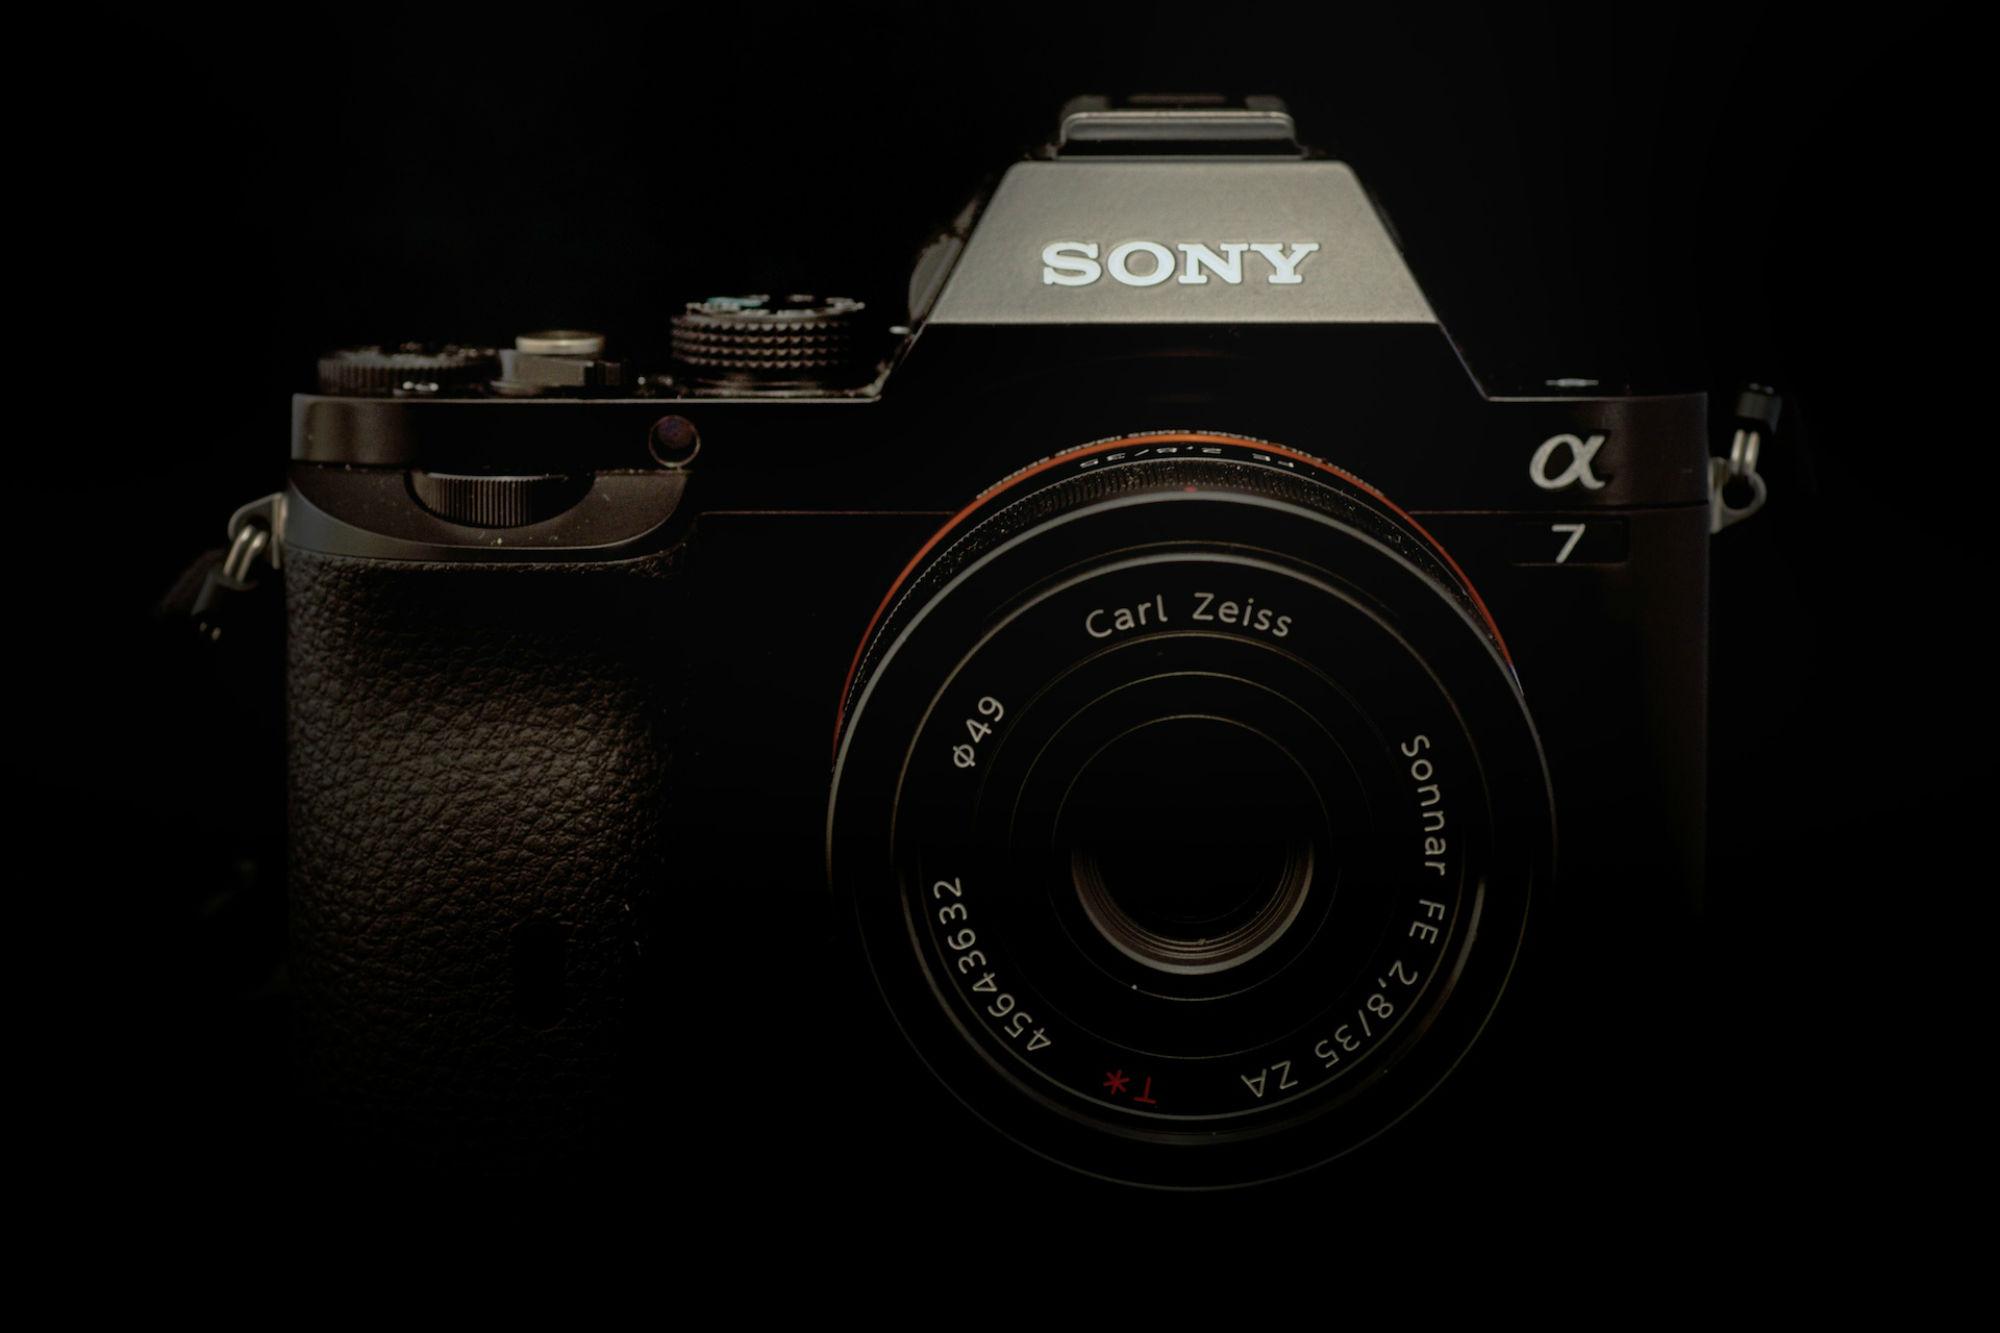 Sony A7 Pancake image